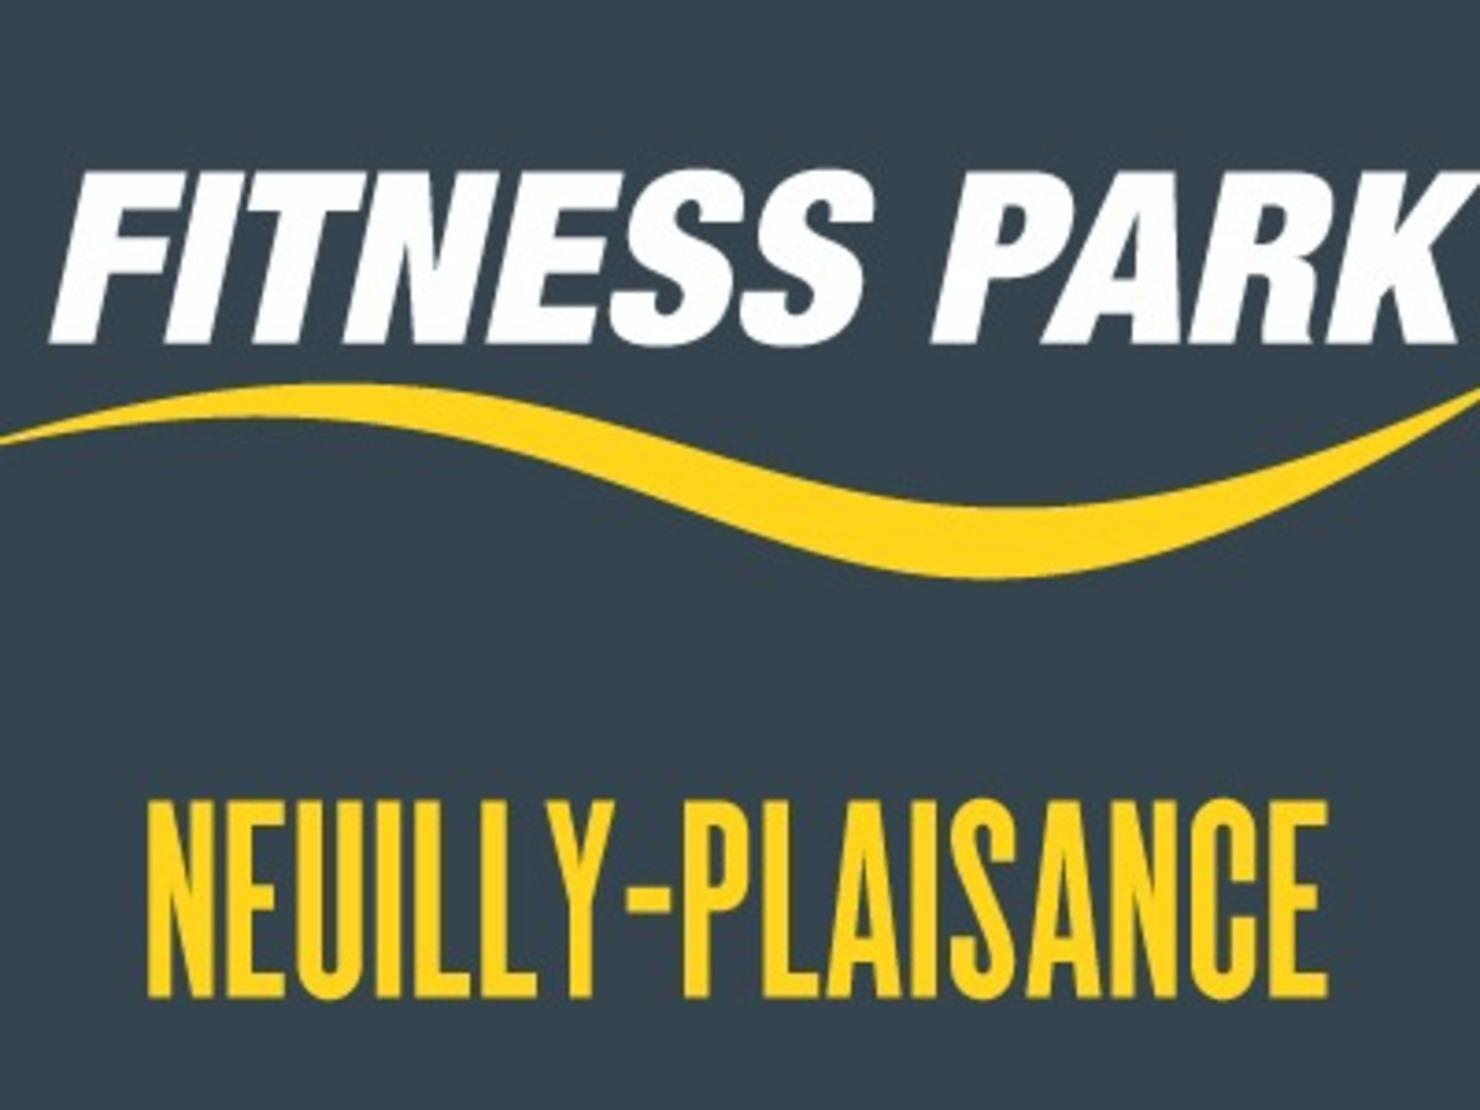 fitness park neuilly plaisance neuilly plaisance tarifs avis horaires essai gratuit. Black Bedroom Furniture Sets. Home Design Ideas